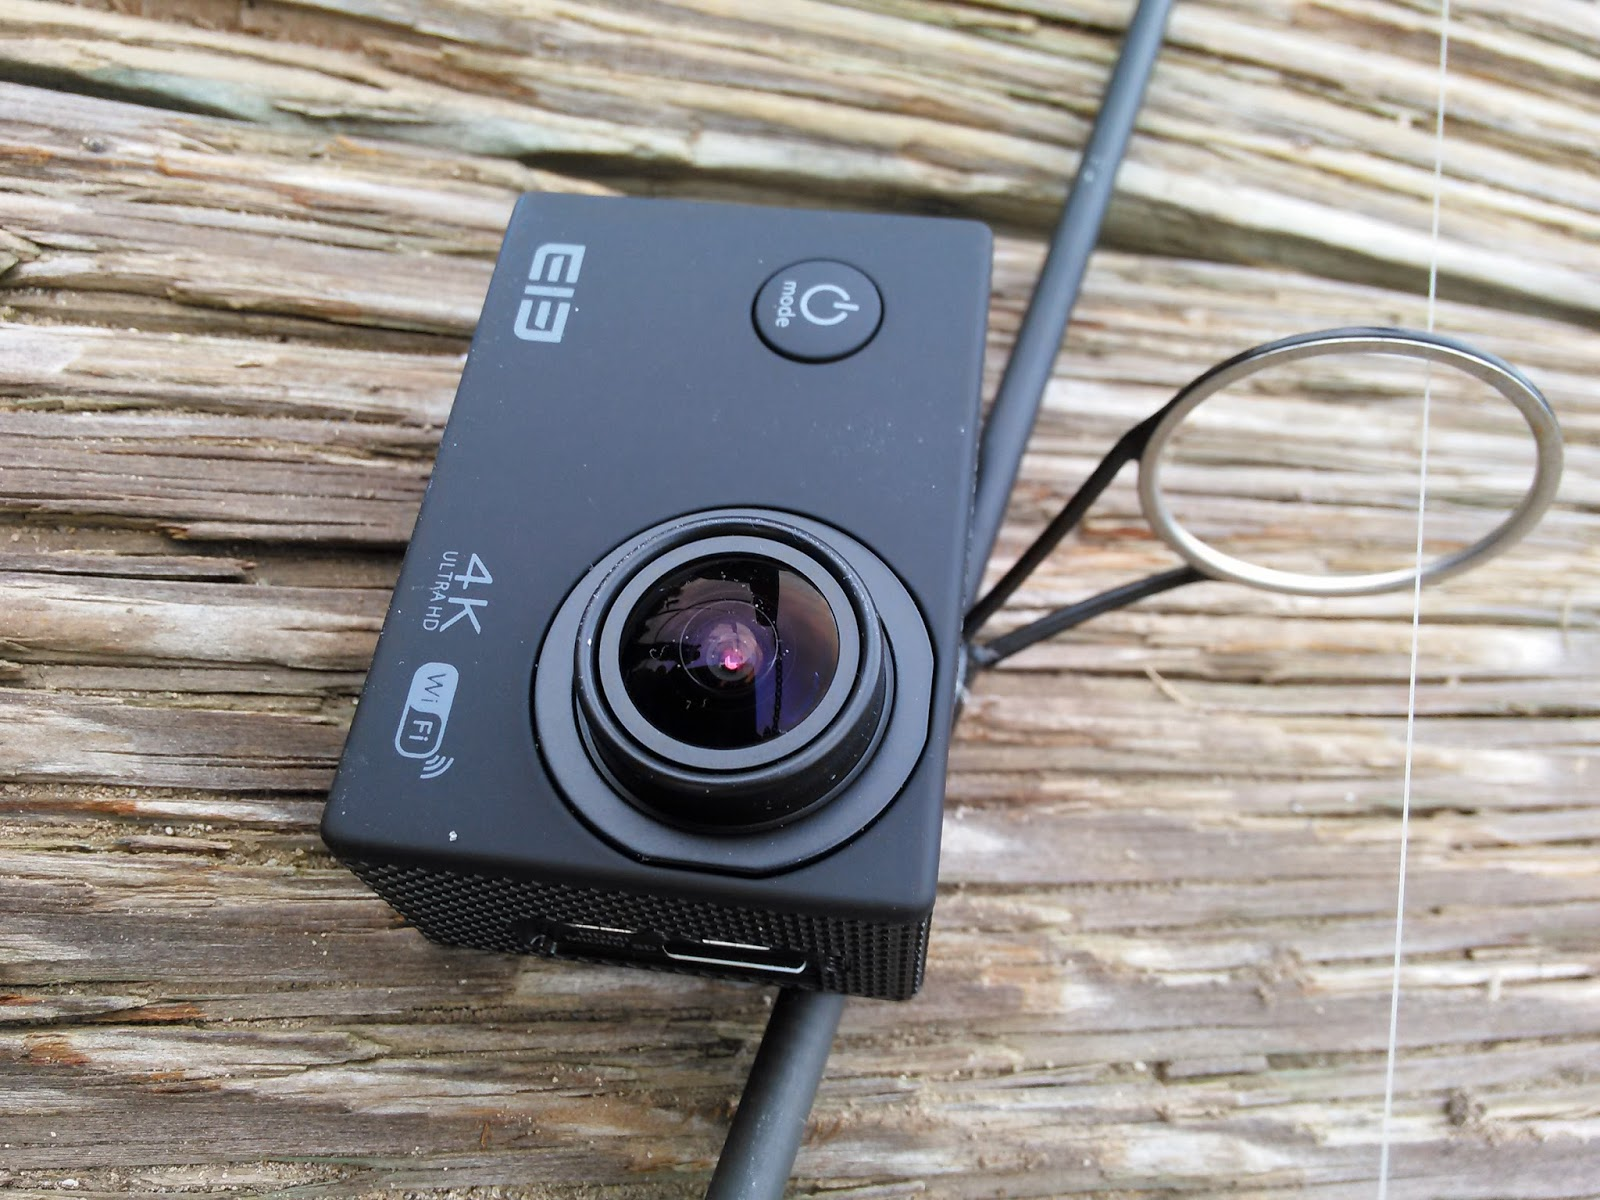 Best Budget Bargain Action Camera: ELE Explorer Action Camera ...